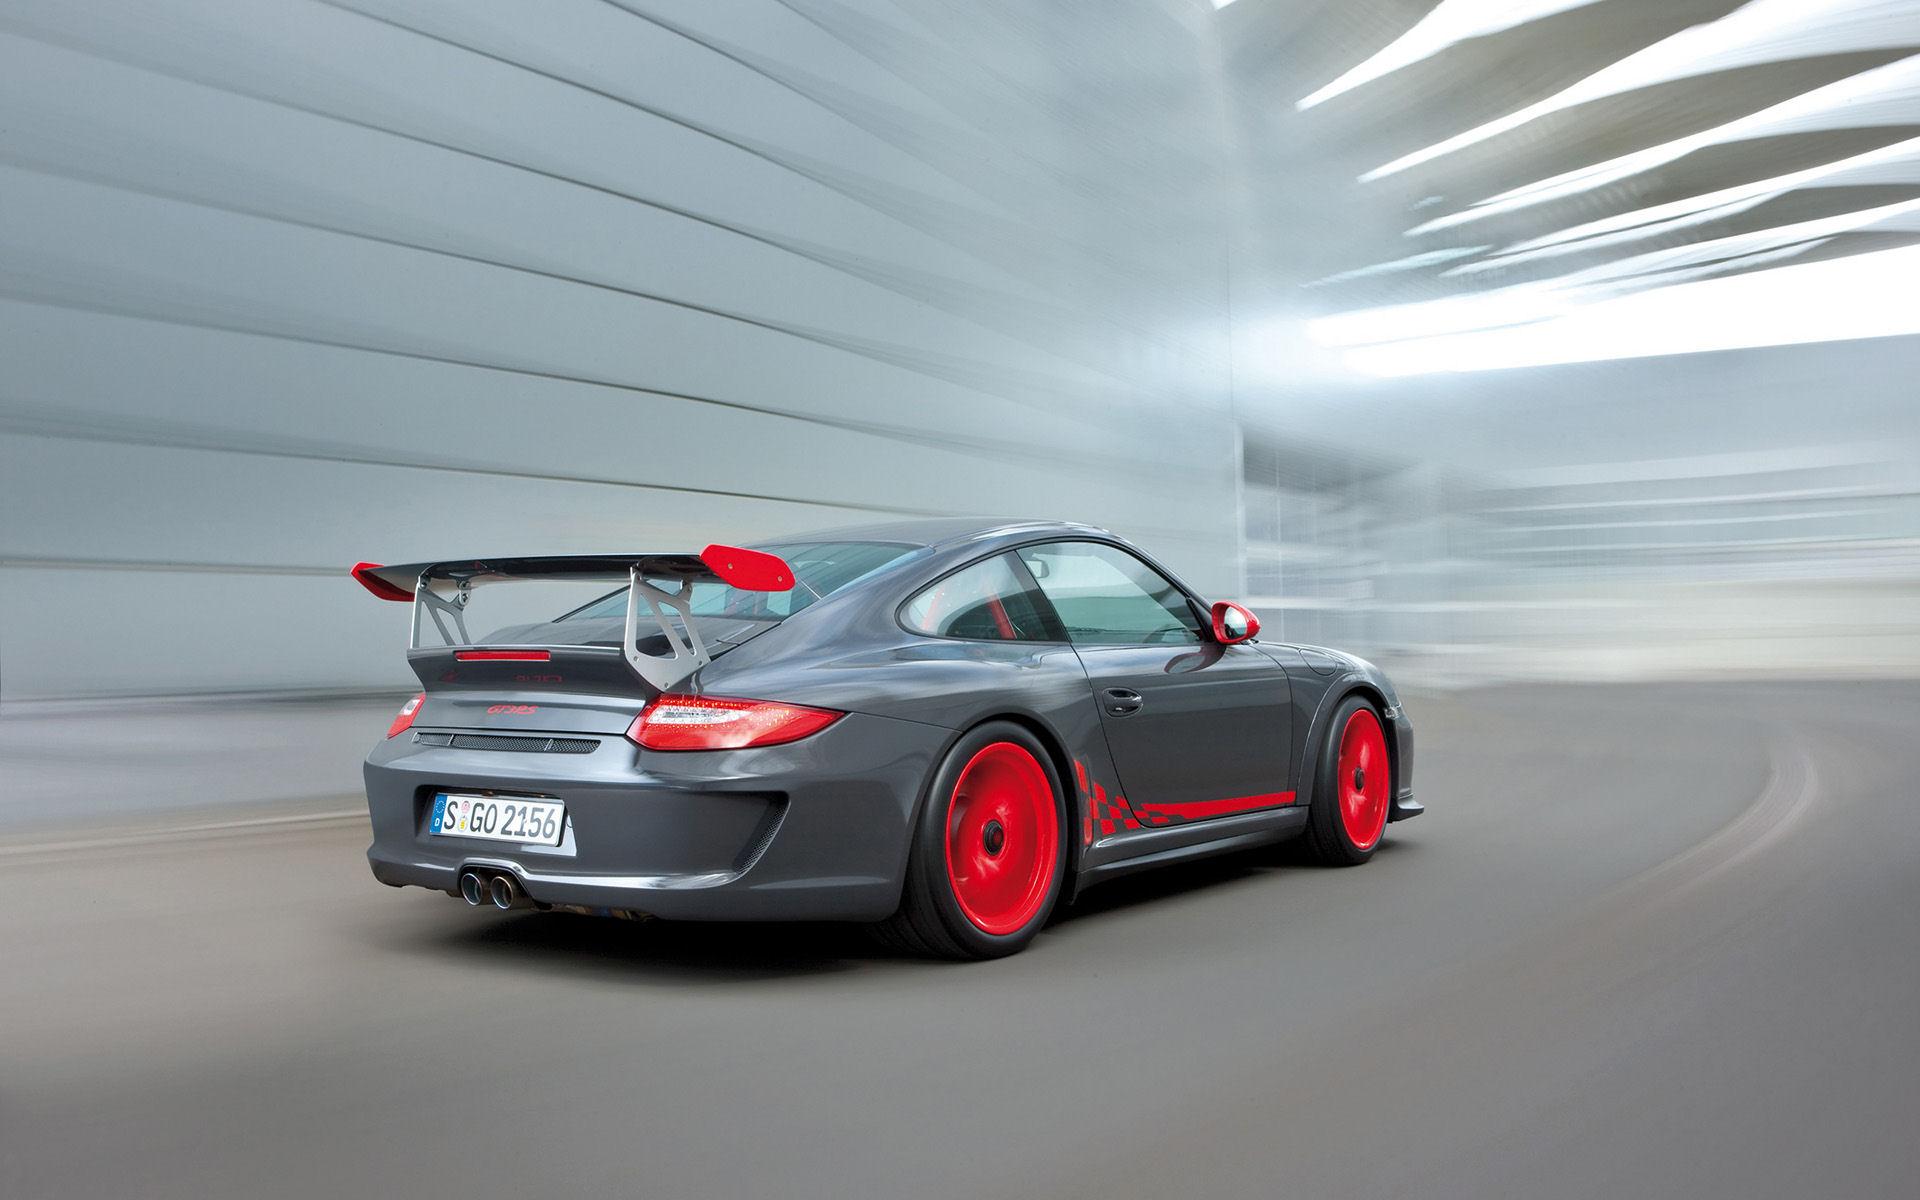 Porsche 996 Turbo >> Porsche 911, 996, 997 Carrera S, 4S, GT3, Turbo - Free Widescreen Wallpaper / Desktop Background ...